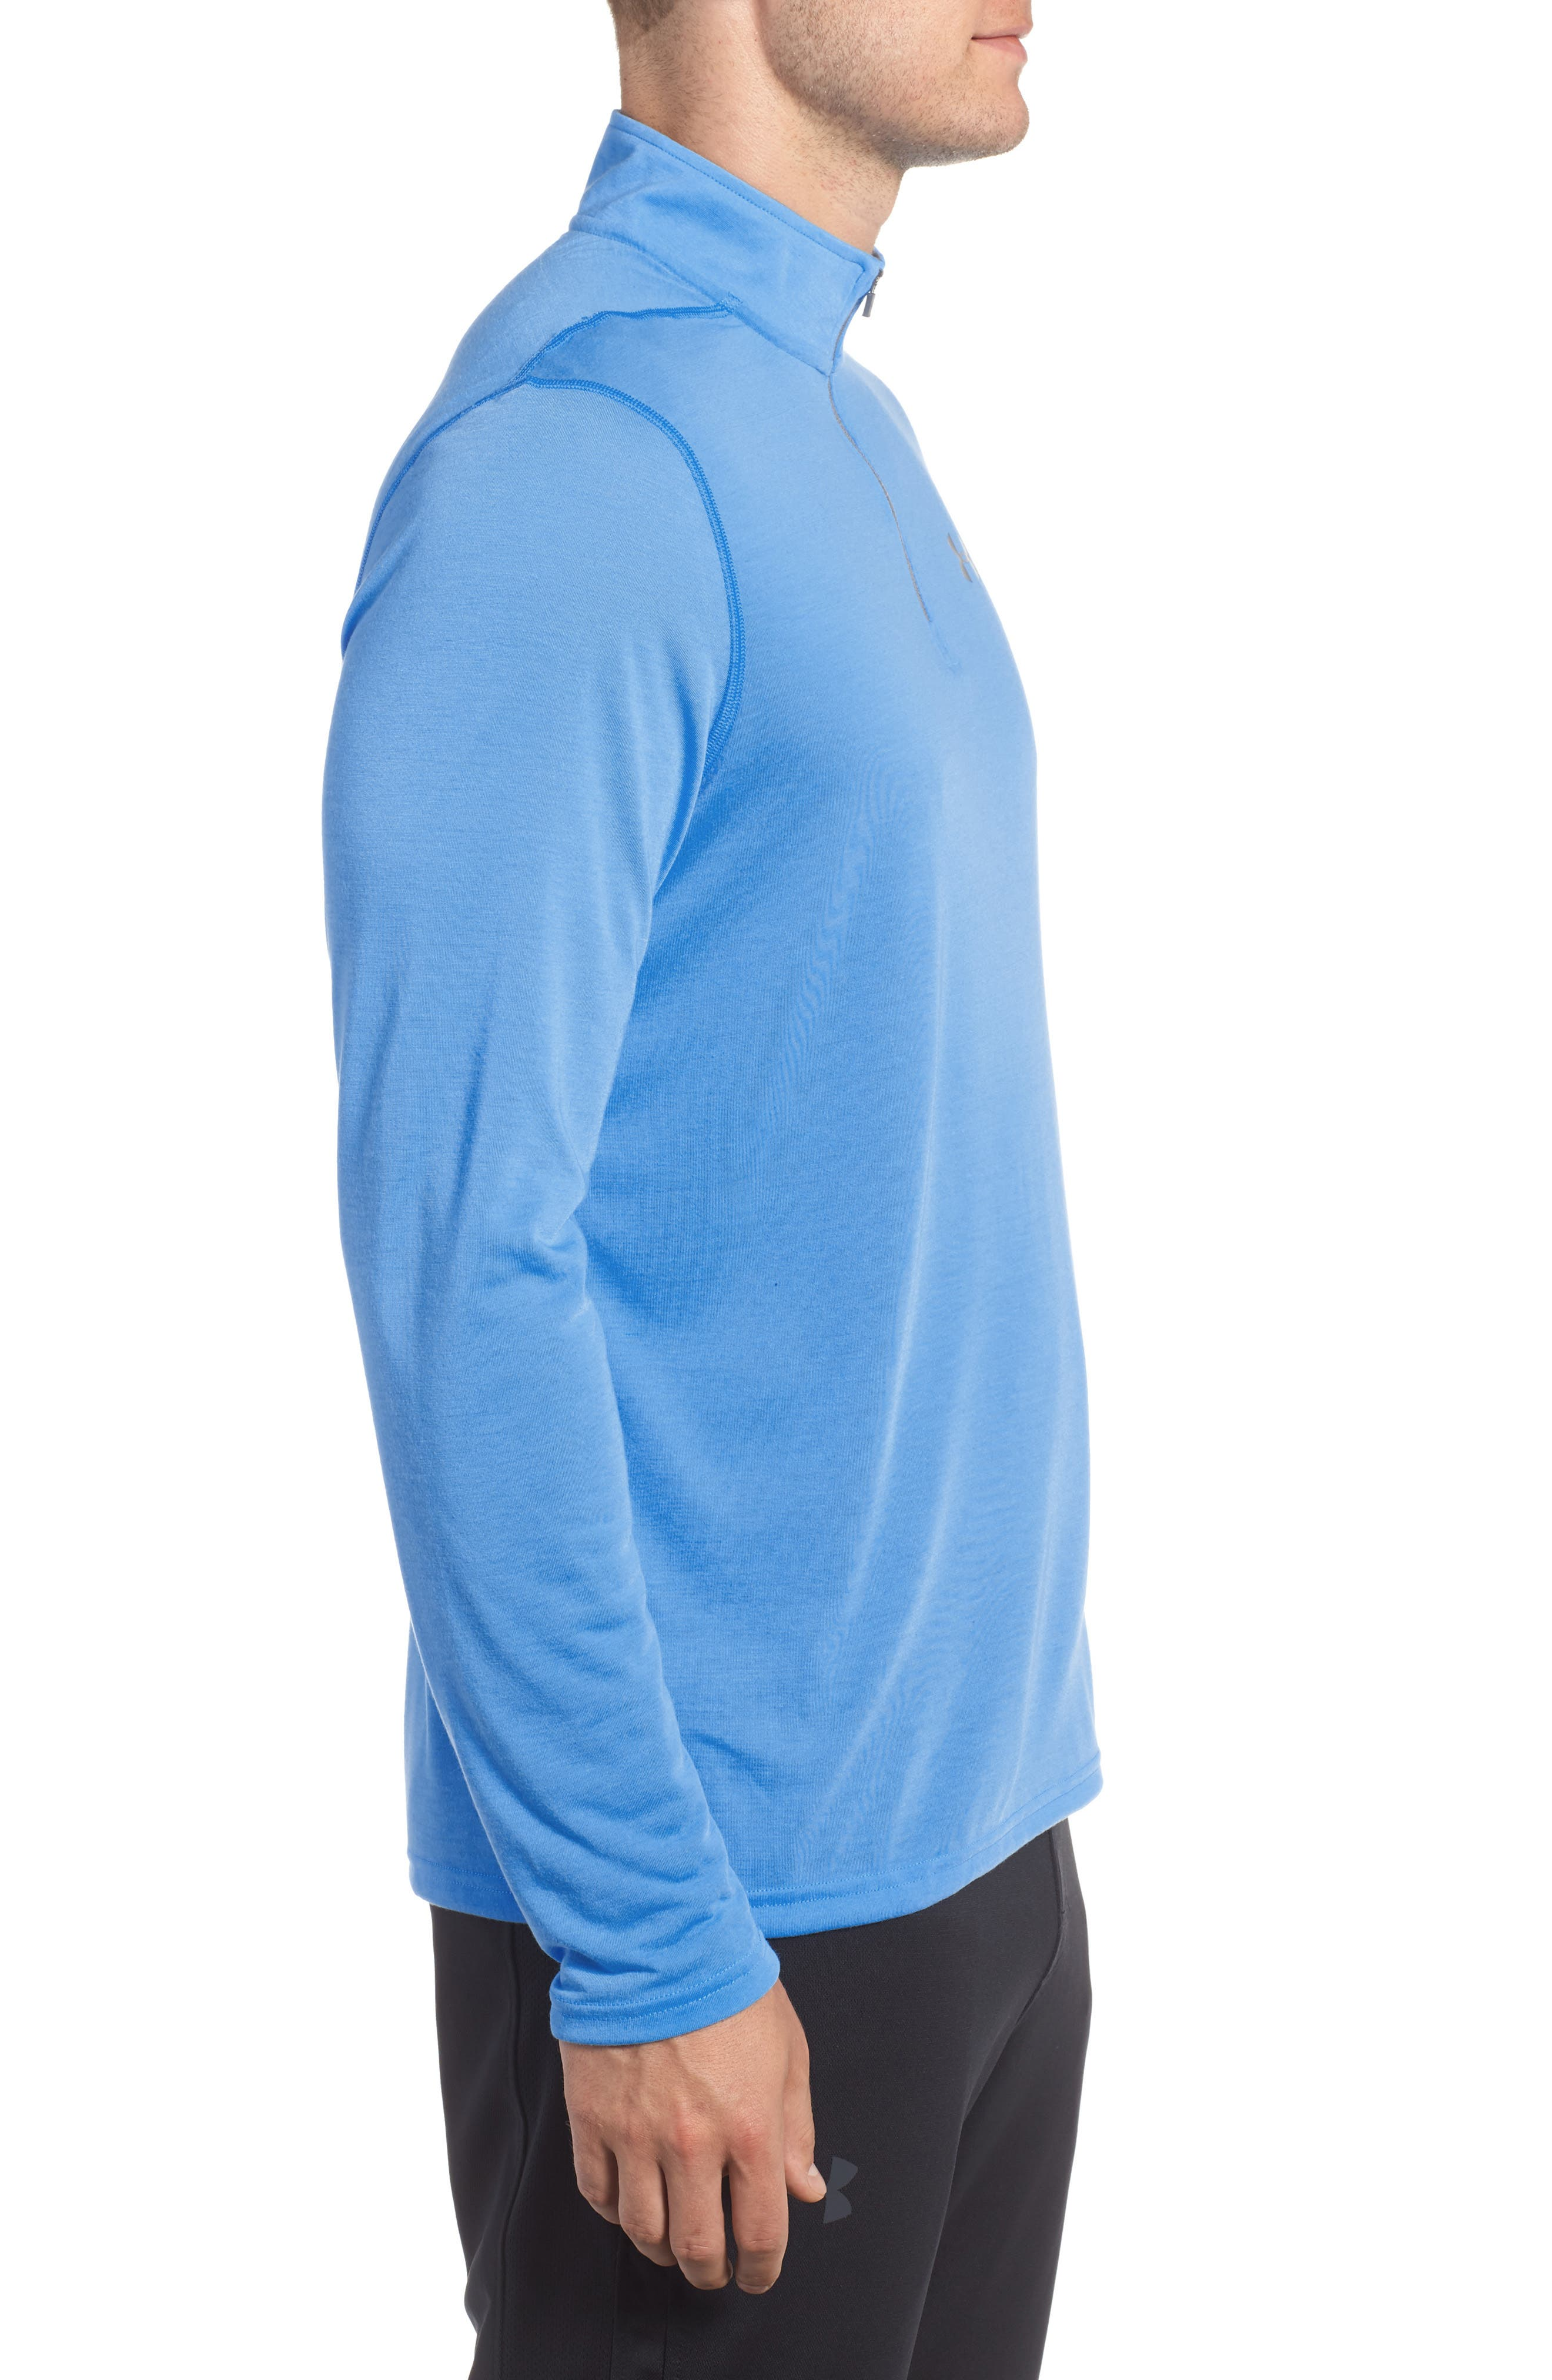 Threadborne Quarter-Zip Performance Shirt,                             Alternate thumbnail 3, color,                             Mako Blue / Graphite